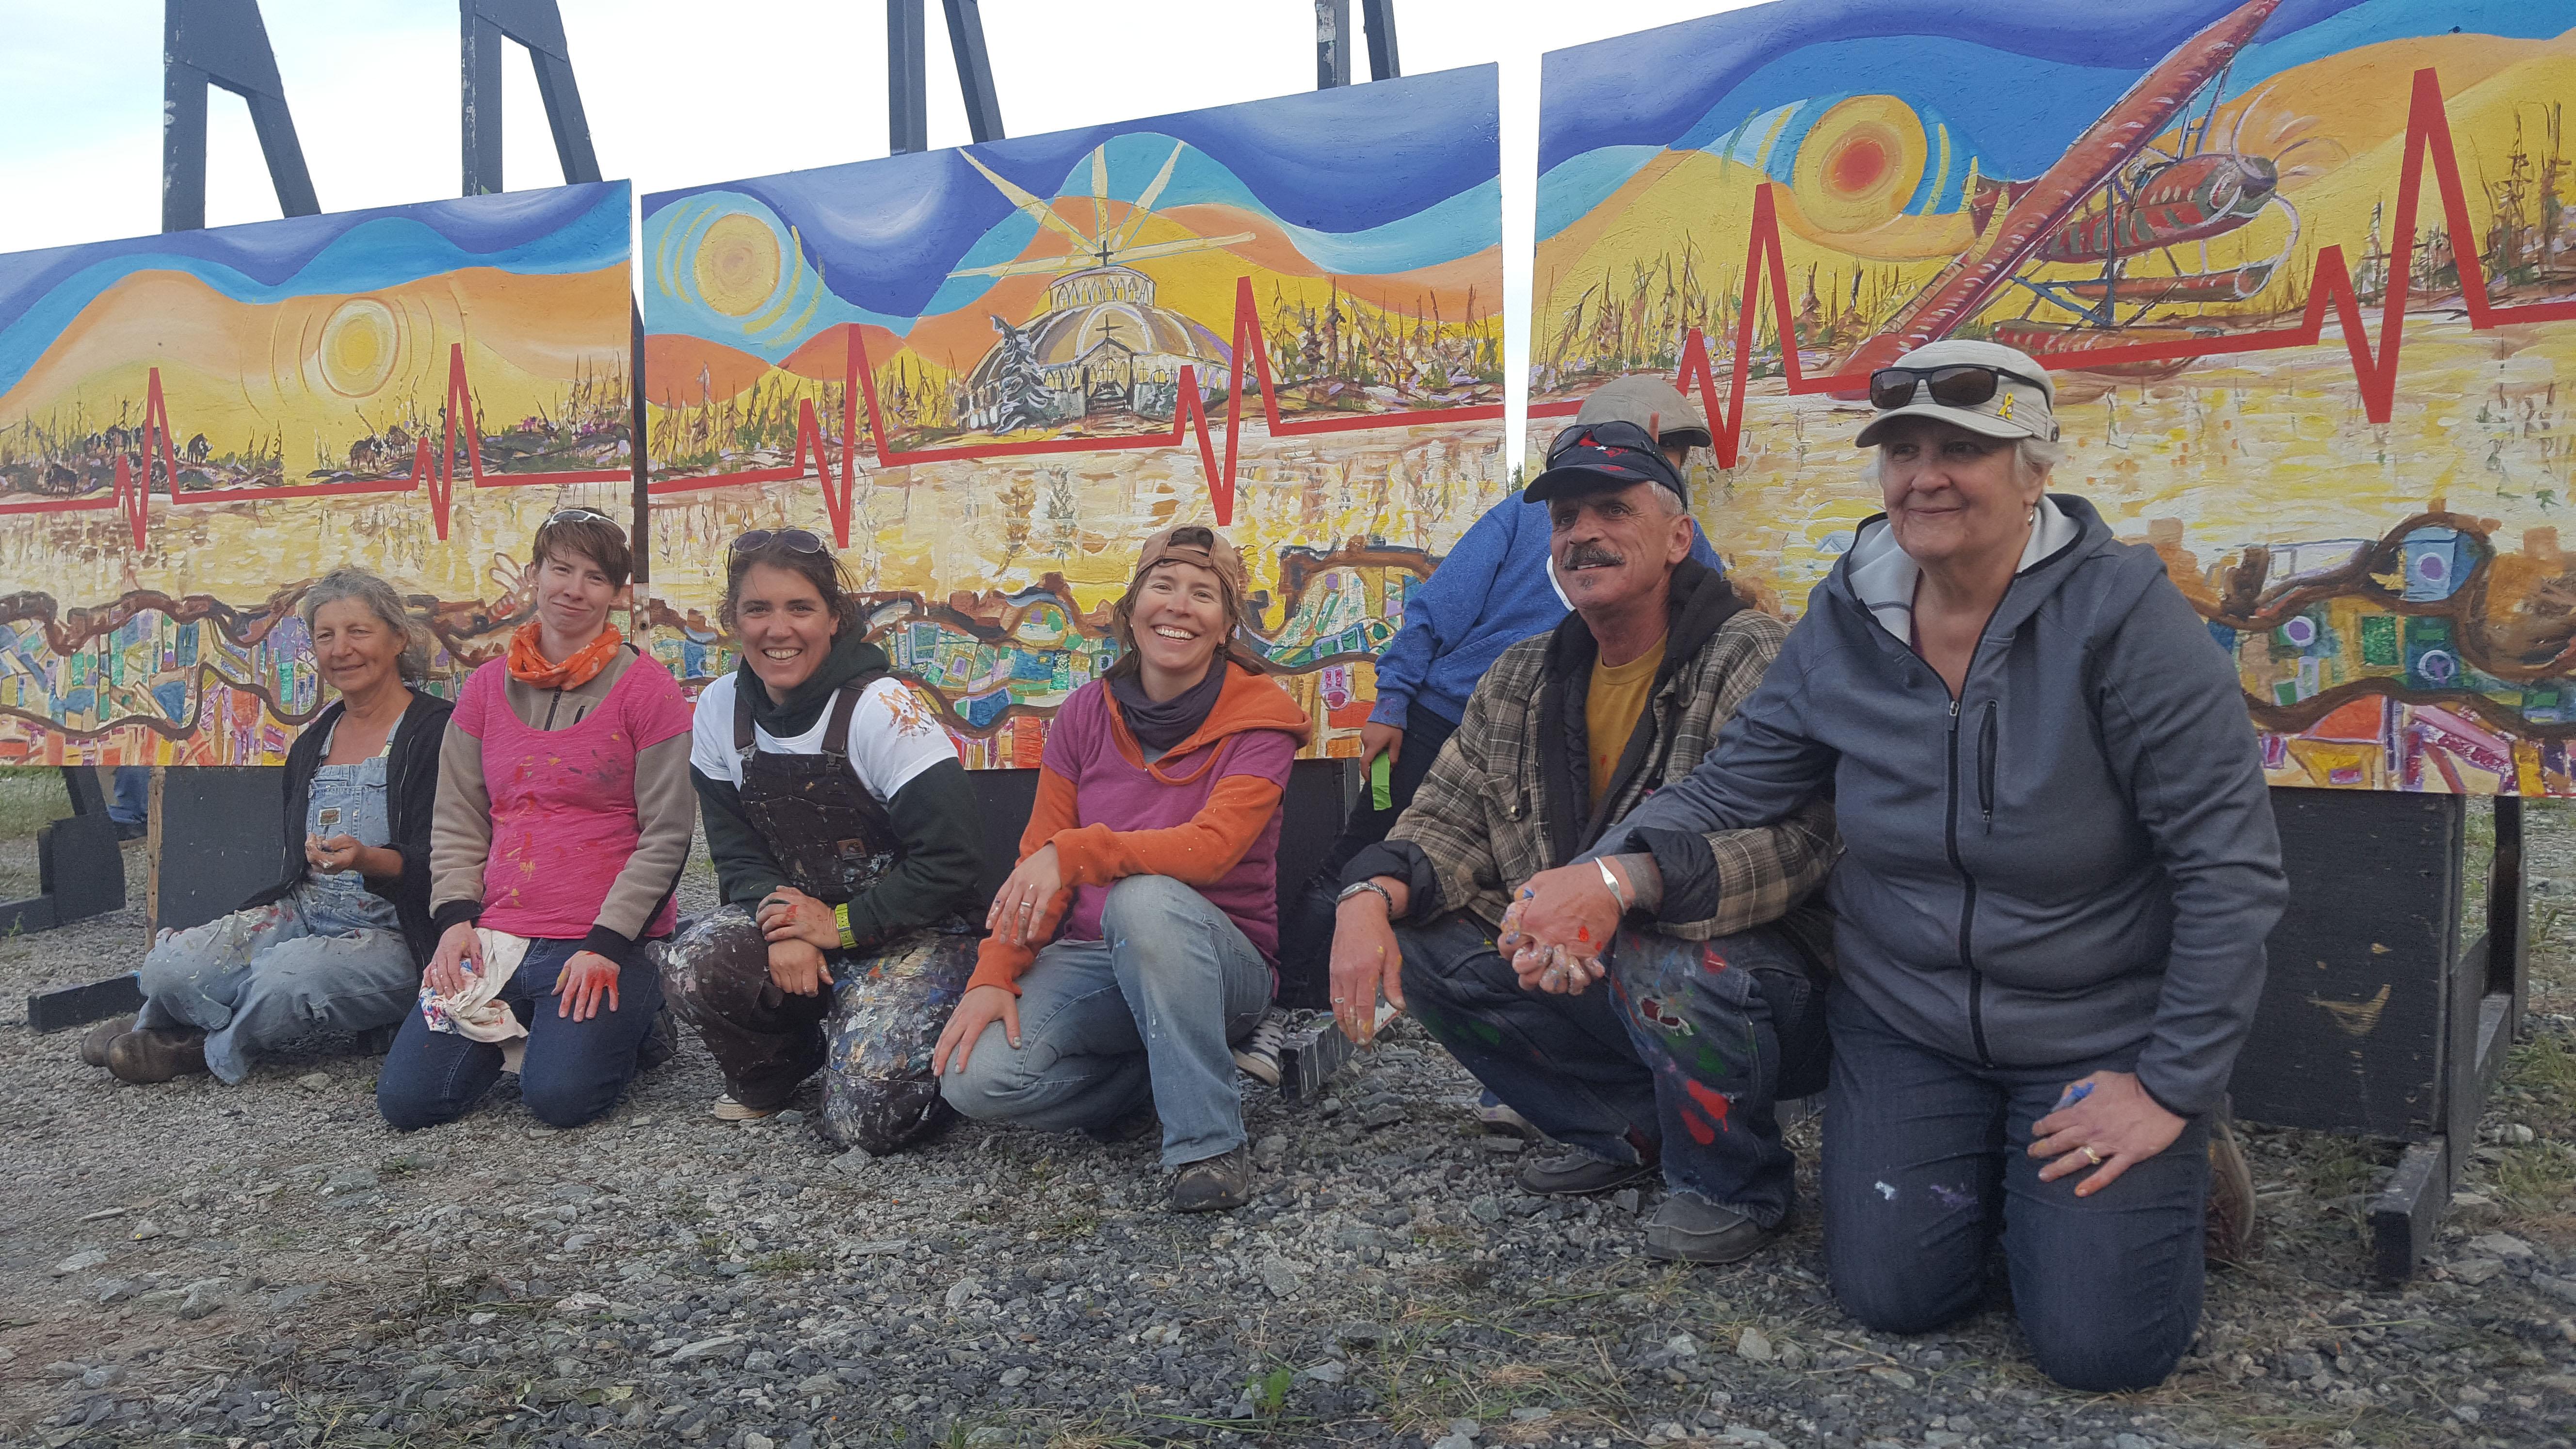 Group photo of BAM (Borderless Art Movement).